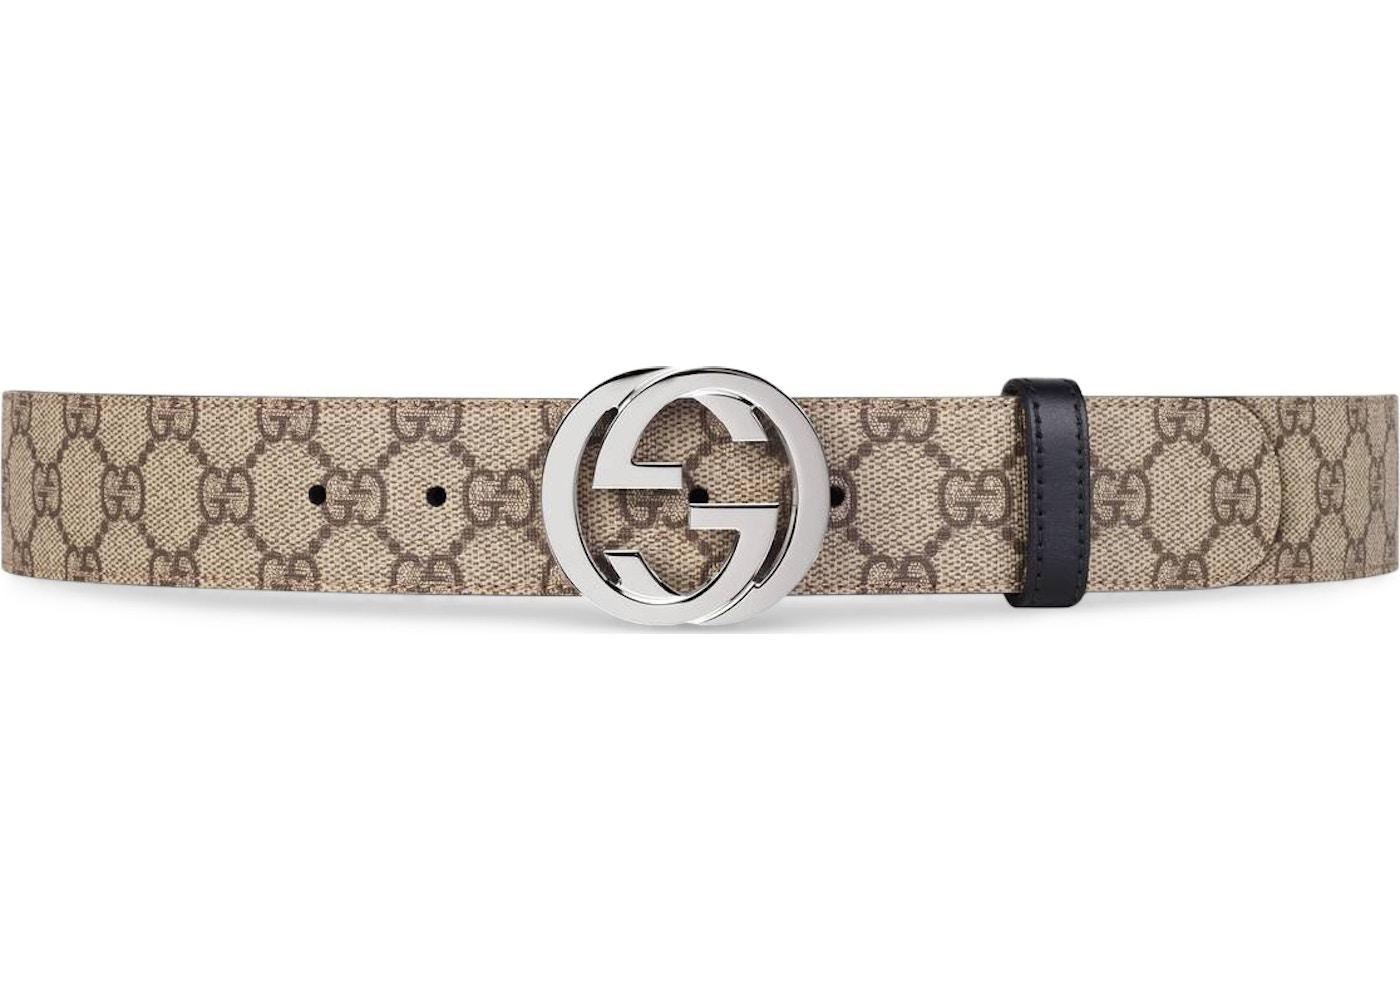 2e20c77c4 Gucci Reversible Belt GG Supreme Palladium Interlocking G Buckle ...